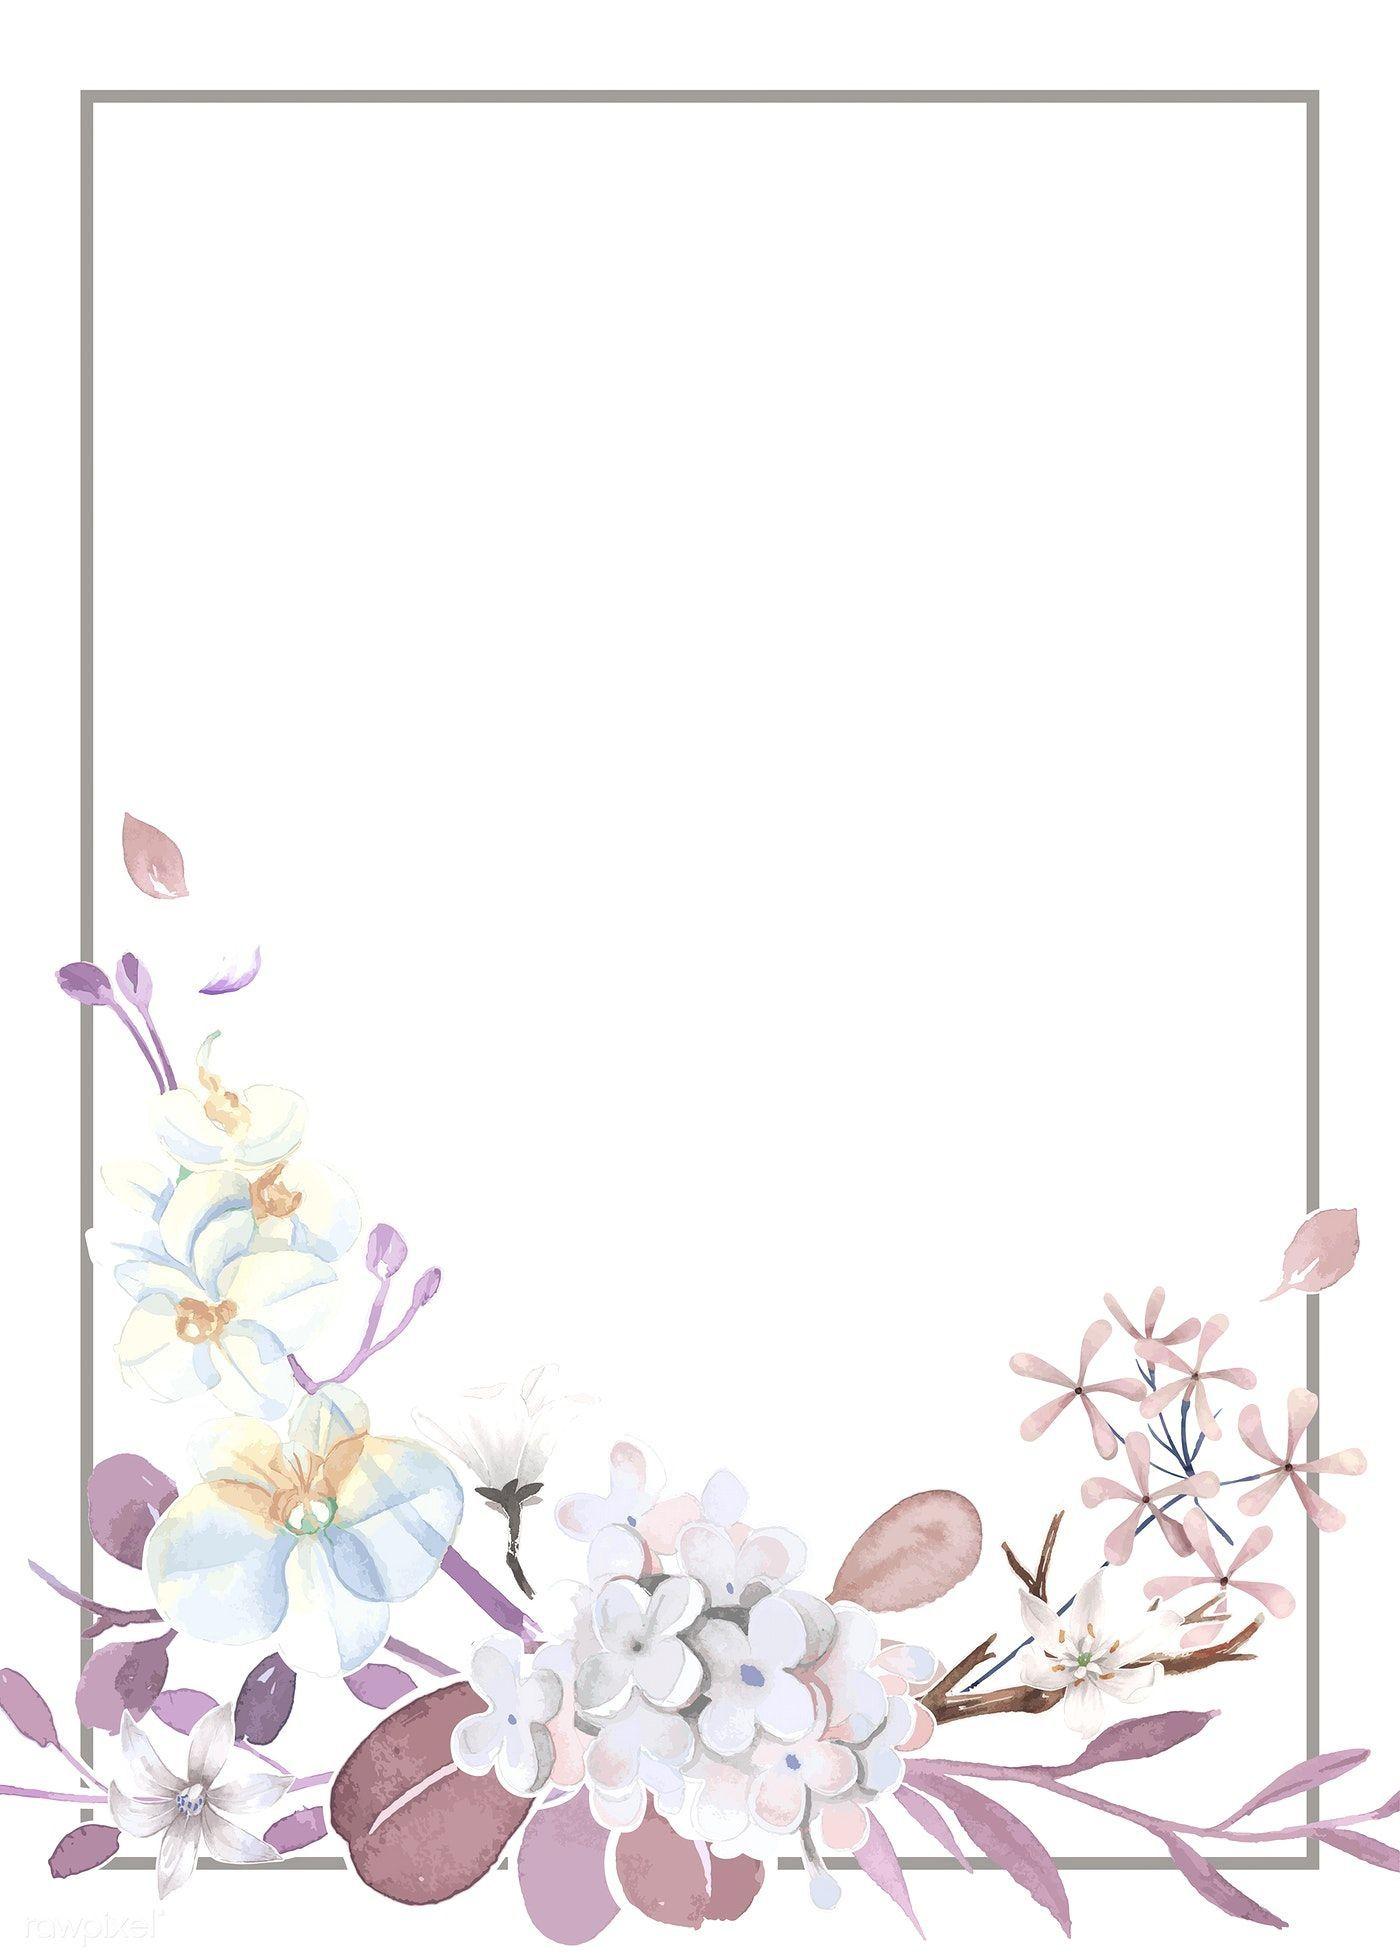 004 Phenomenal Printable Greeting Card Template High Definition  Templates Print Free BirthdayFull